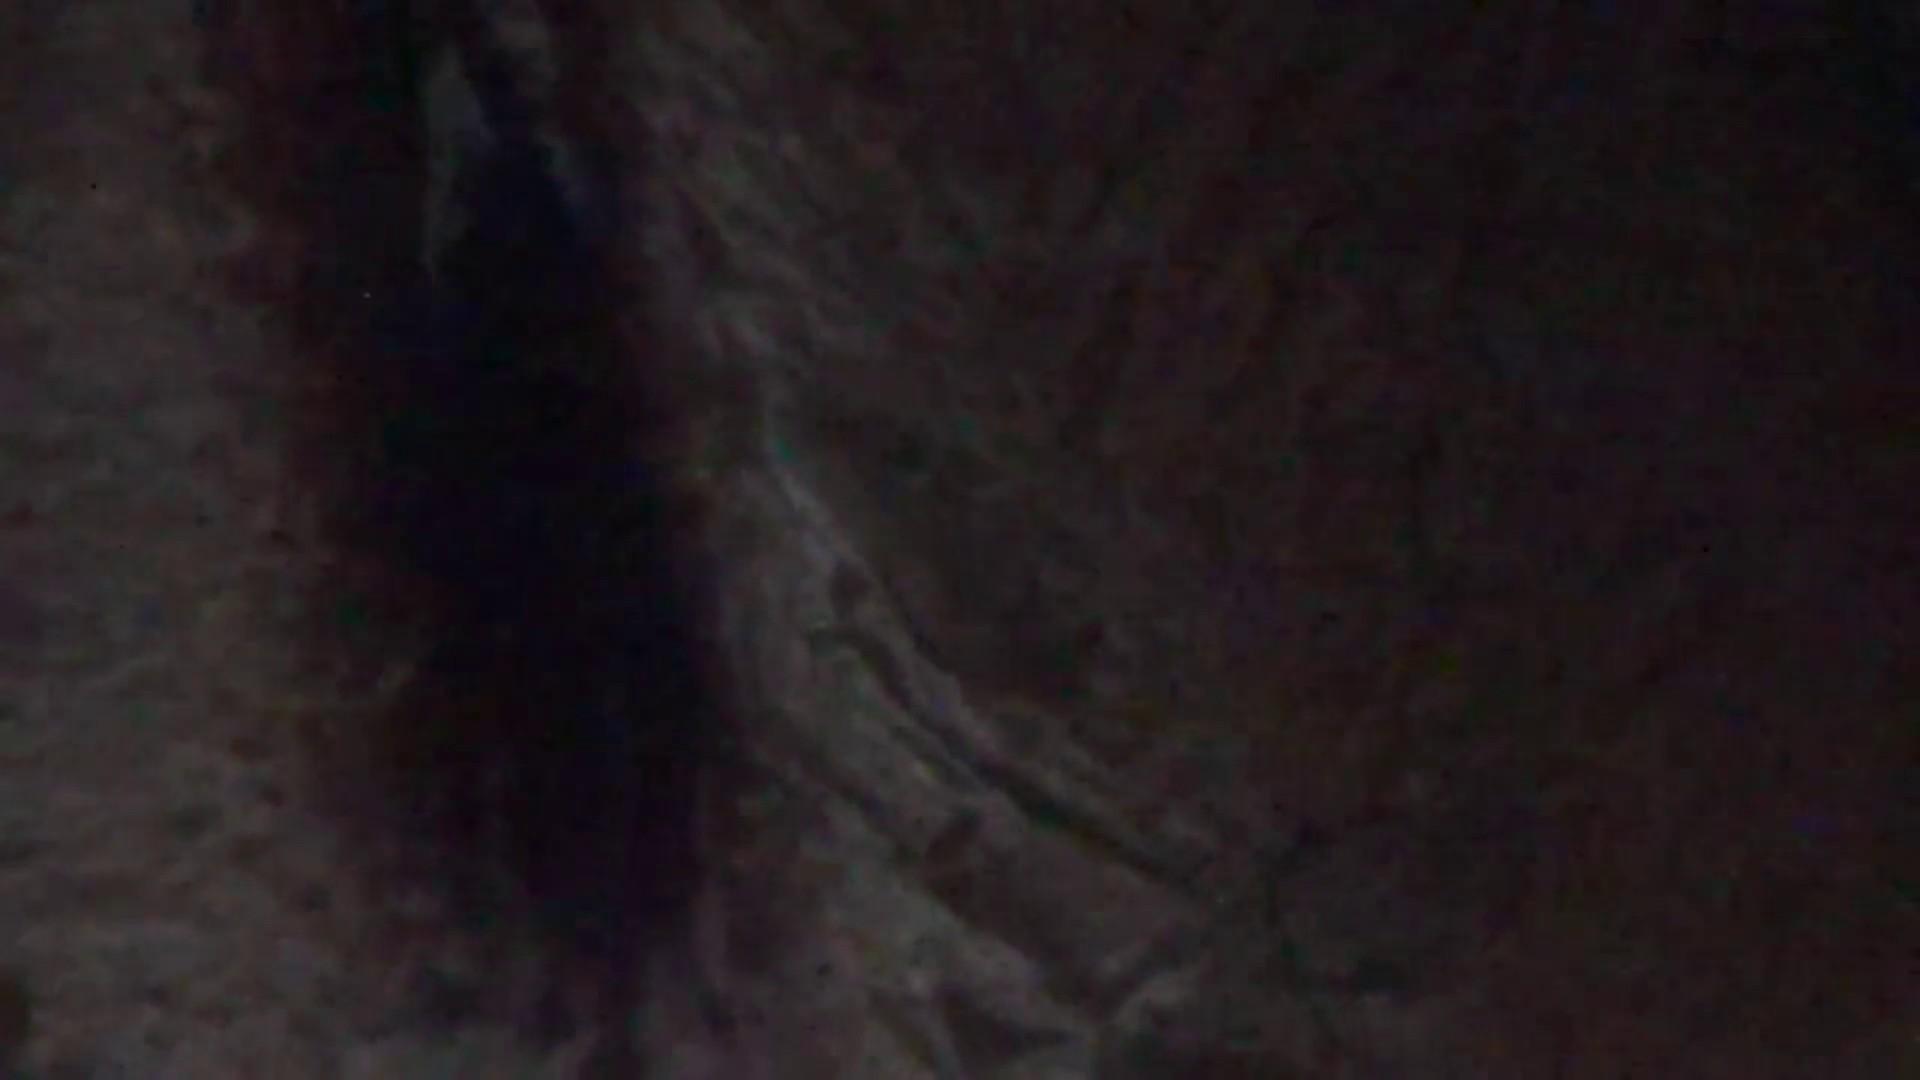 JD盗撮 美女の洗面所の秘密 Vol.44 丸見え アダルト動画キャプチャ 91枚 51